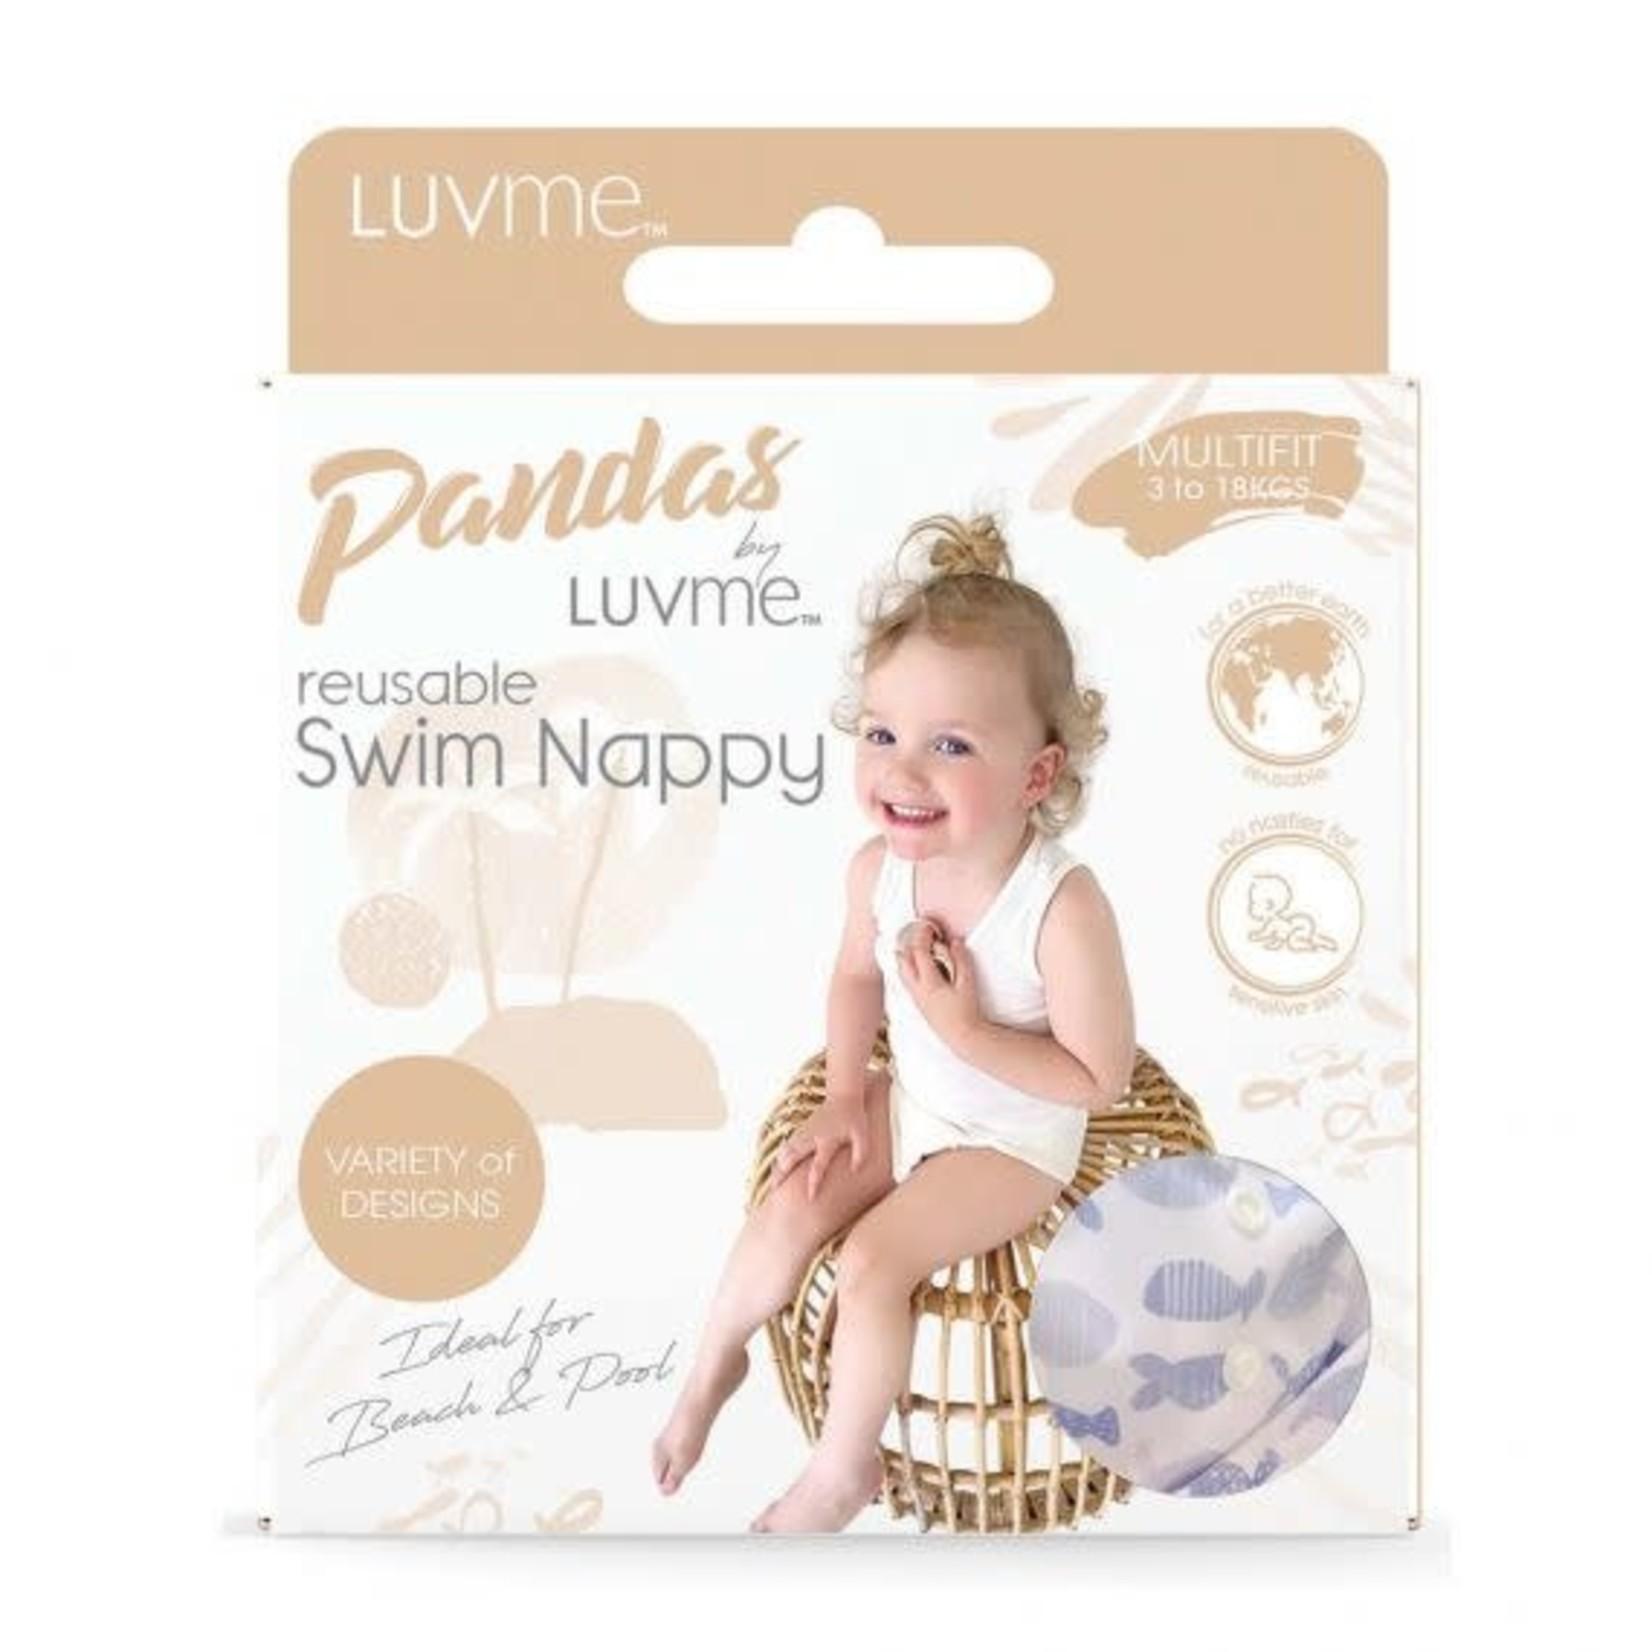 Luvme Pandas by Luvme Reusable Swim Nappy (new designs)